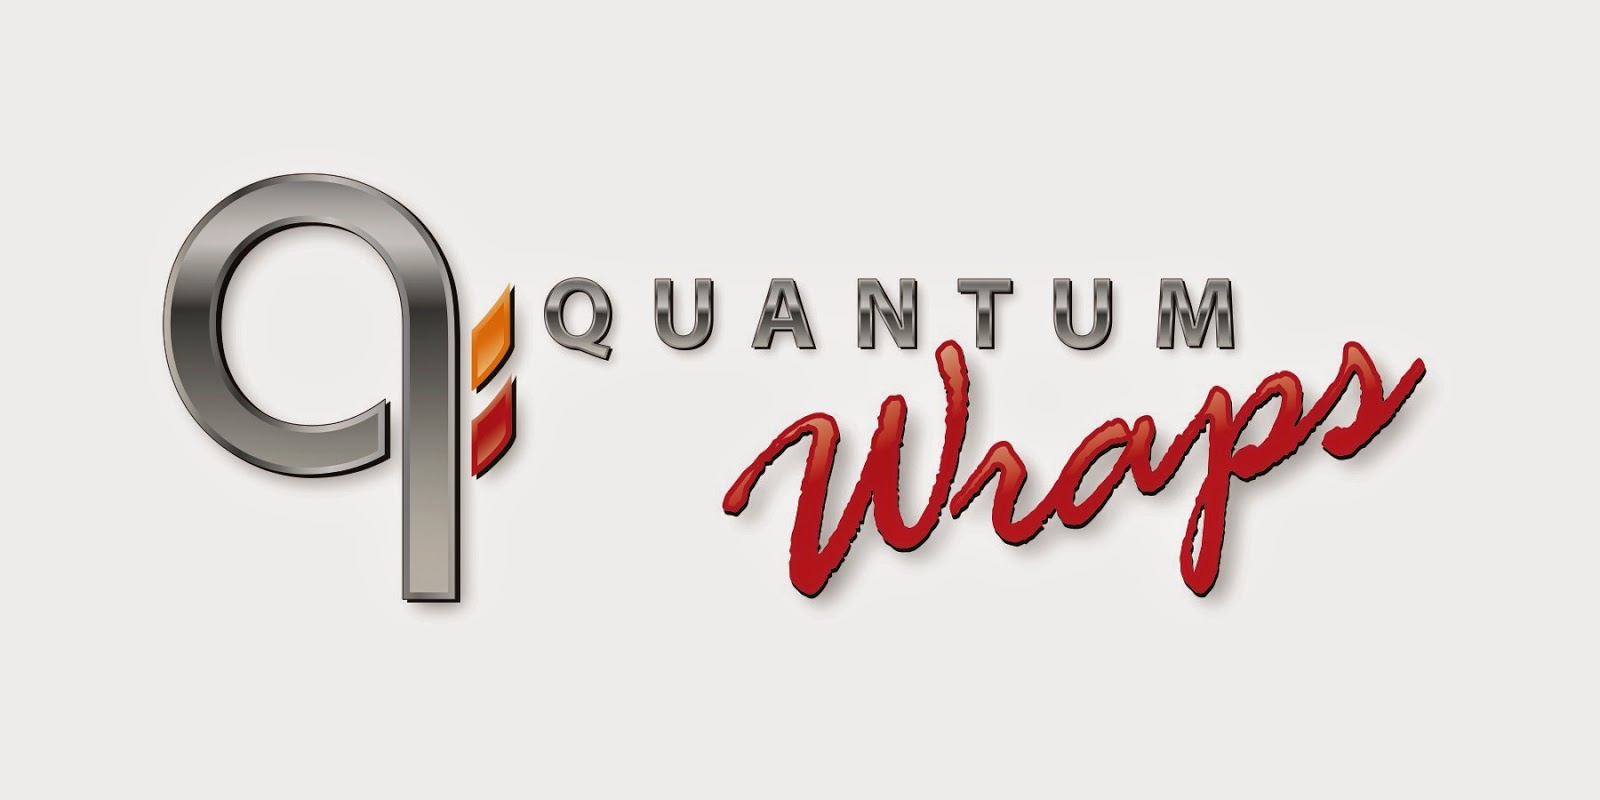 http://www.quantumcreativemedia.com